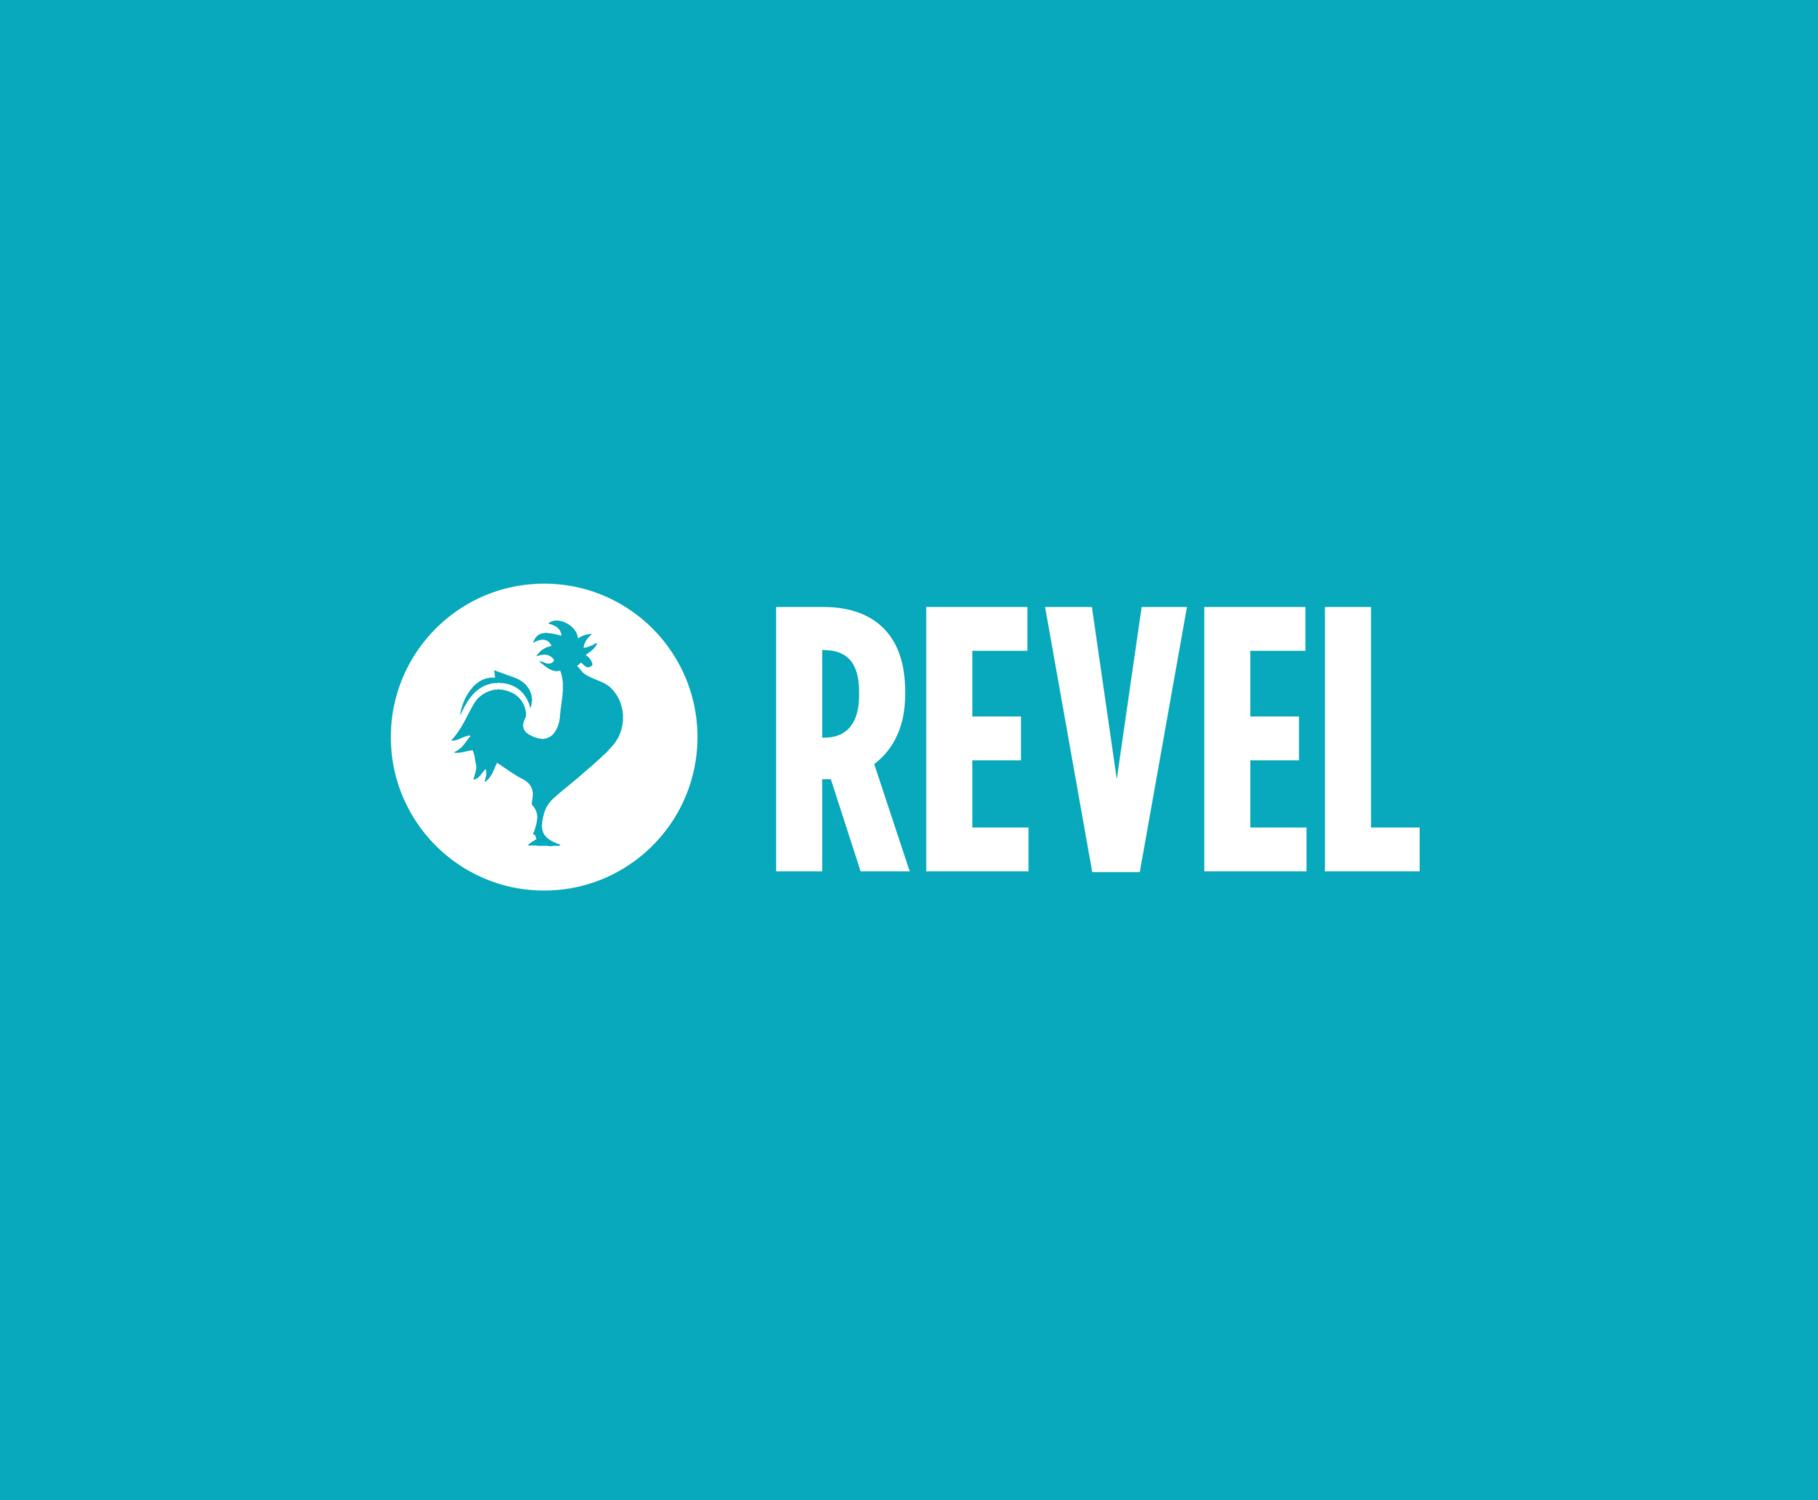 Client: REVEL